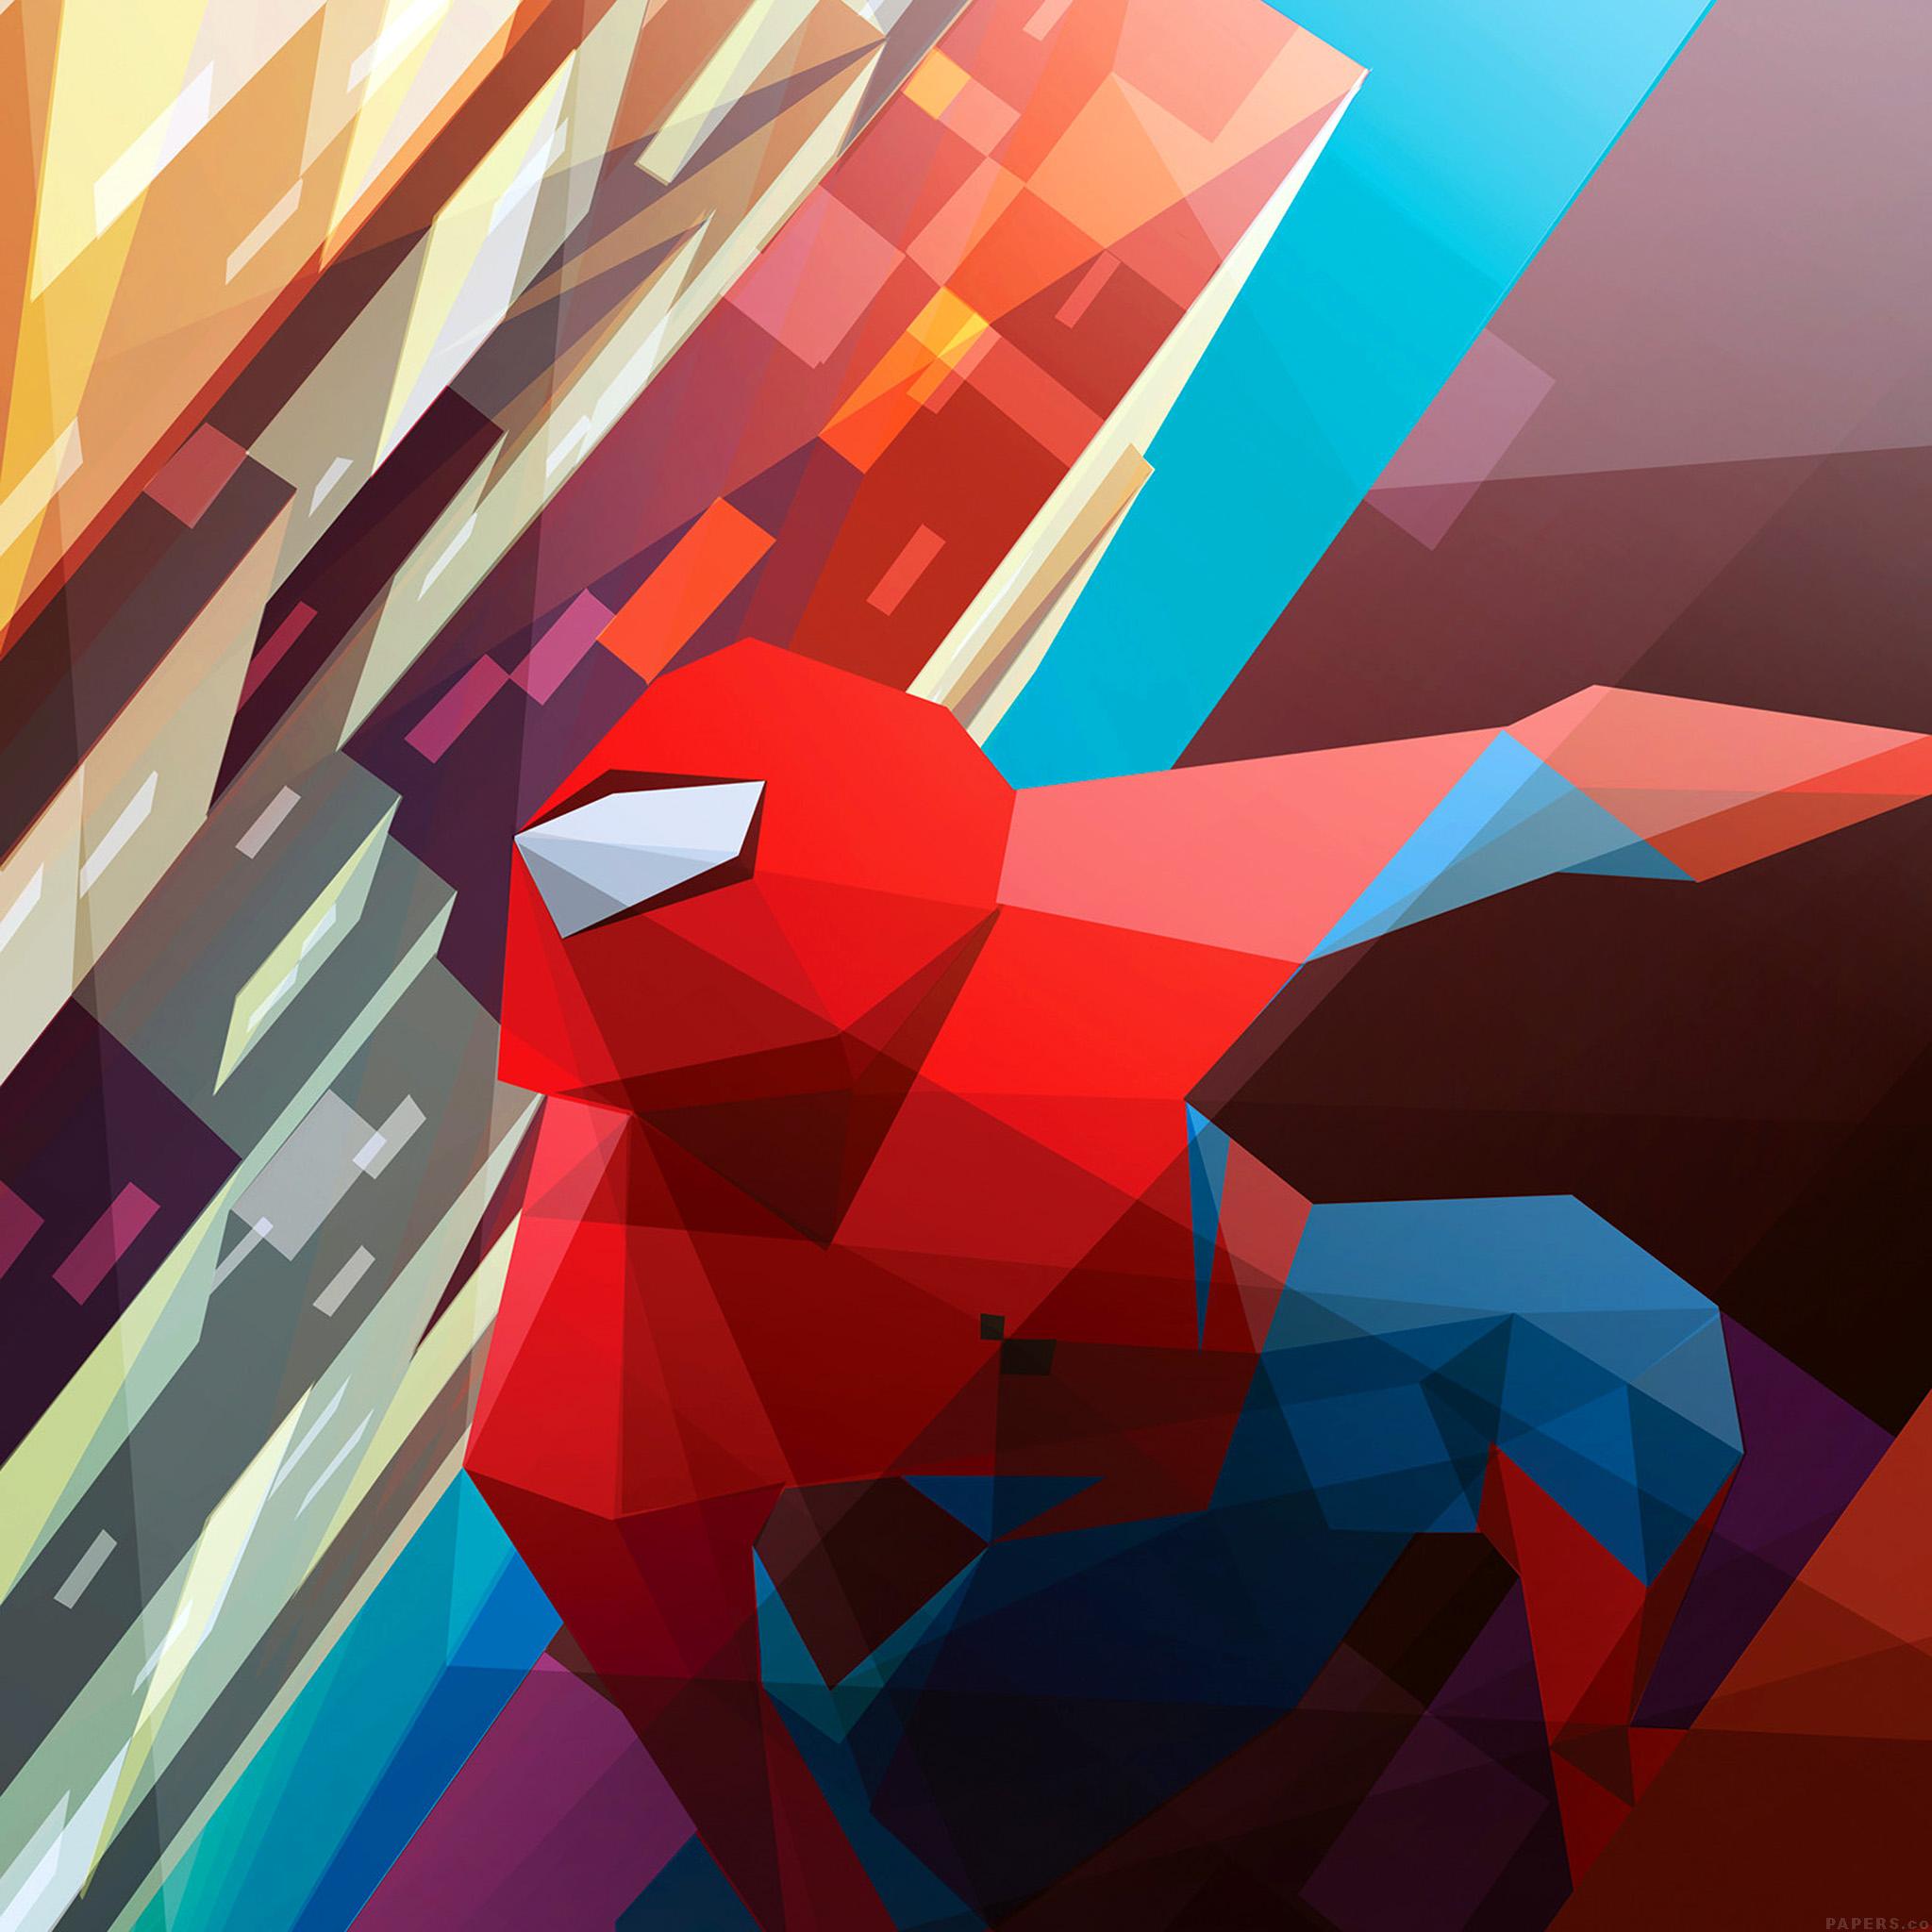 Cute Marvel Iphone Wallpaper Wallpapers